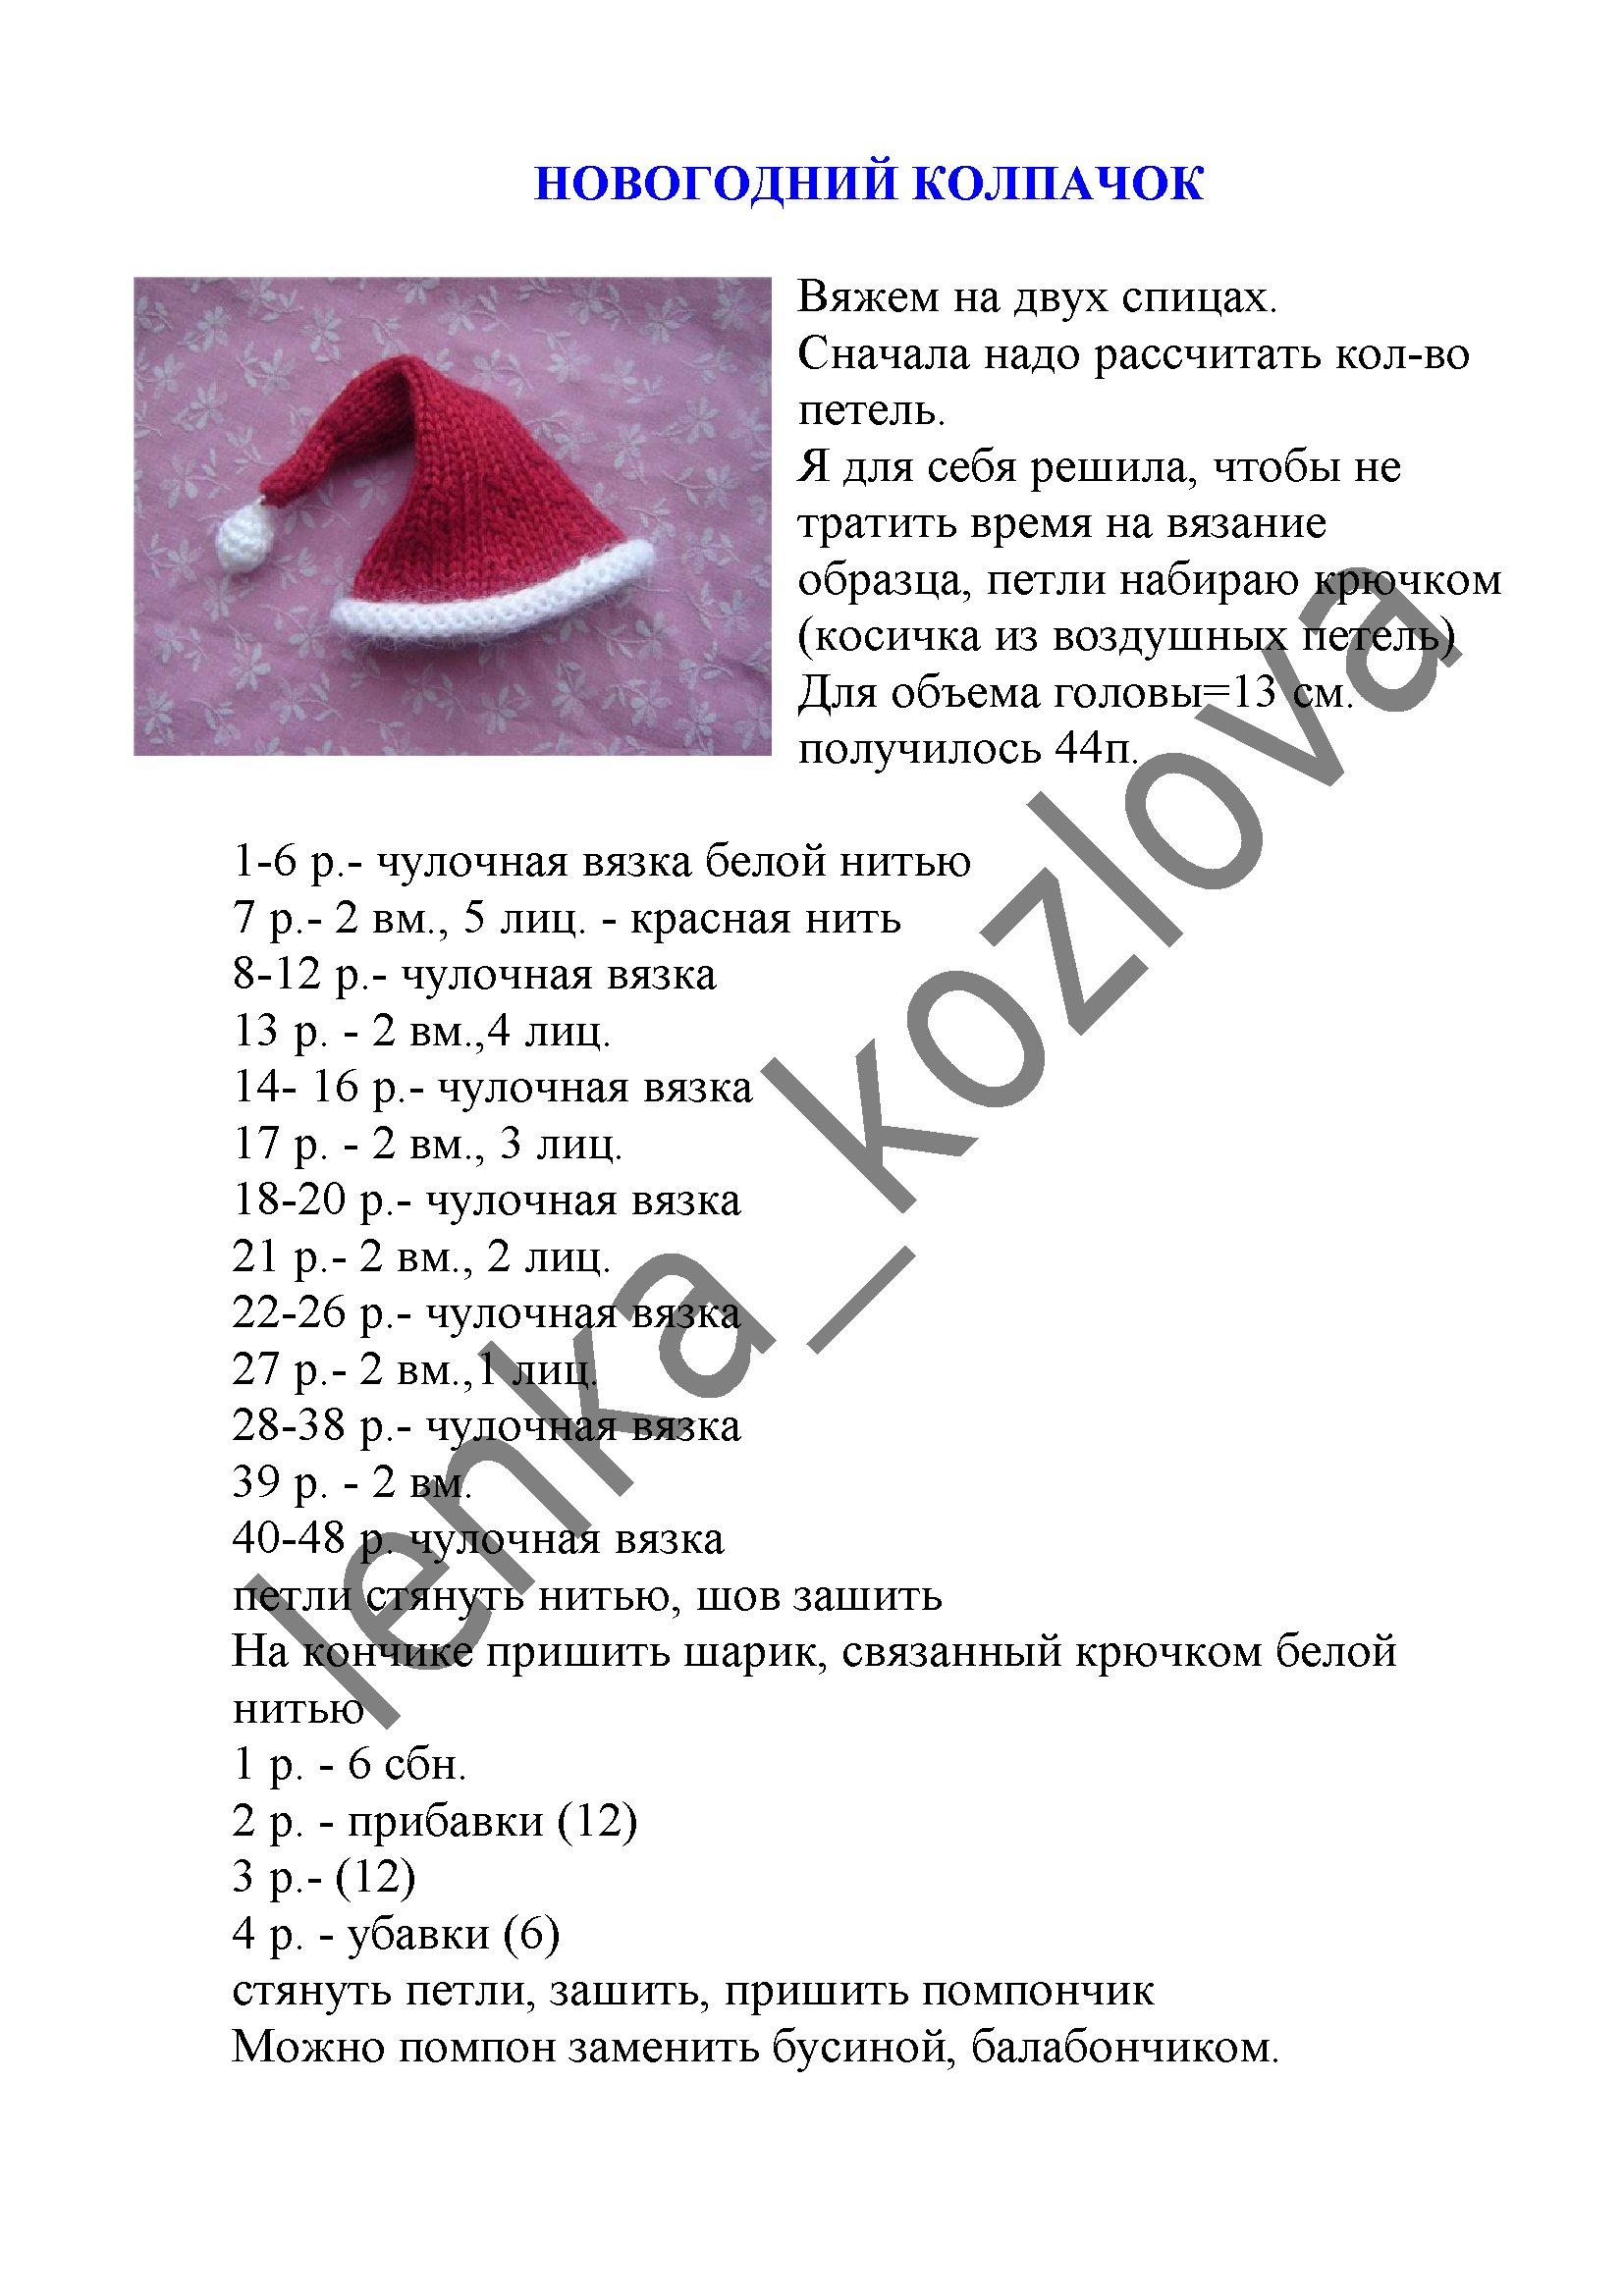 Схема вязания колпака для гнома 28